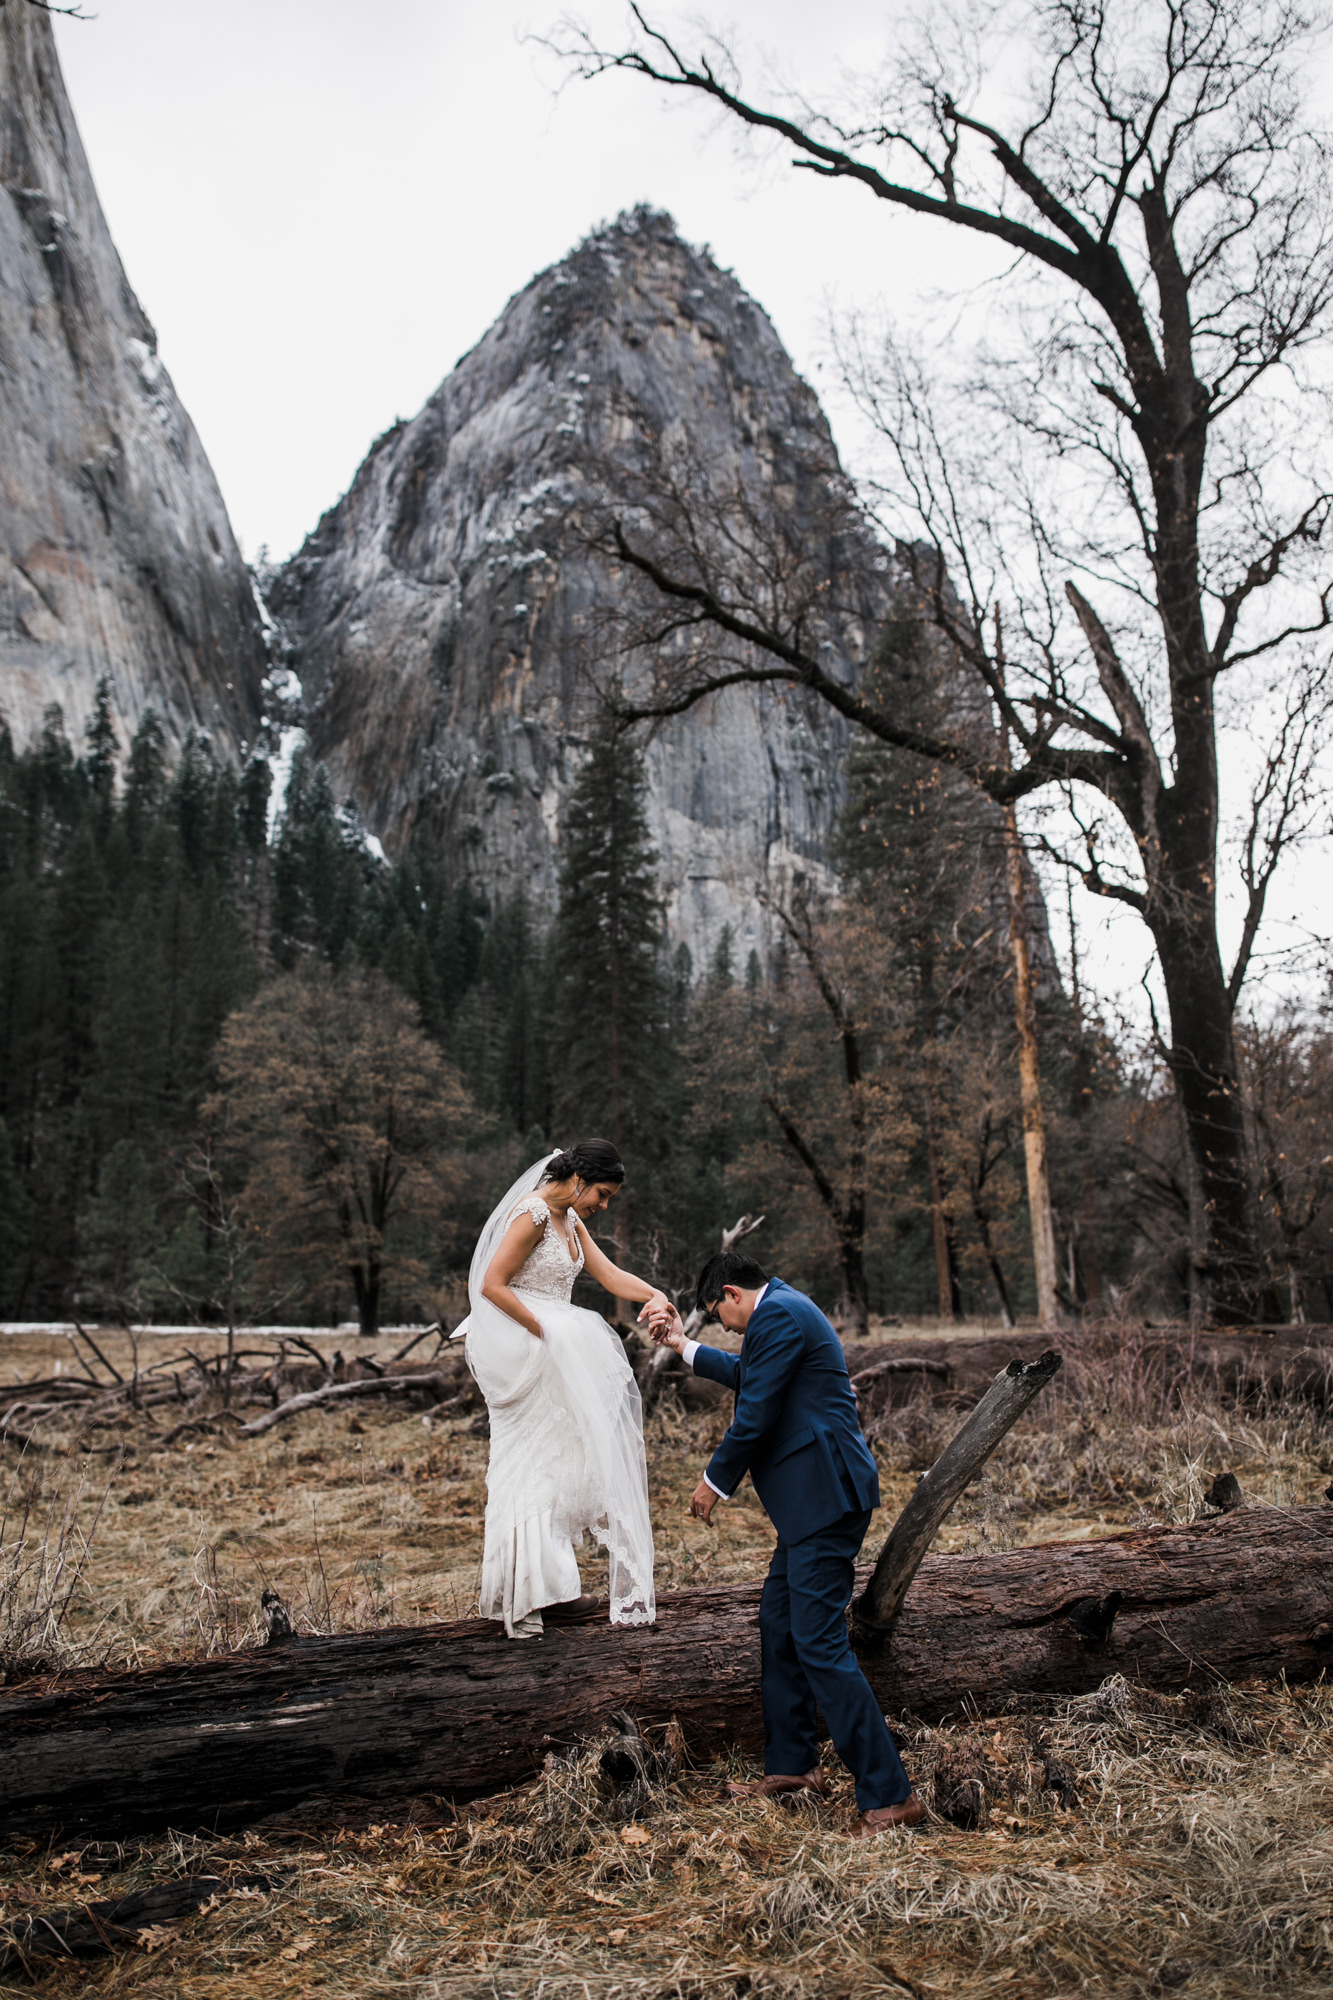 adventure elopement photographer in yosemite